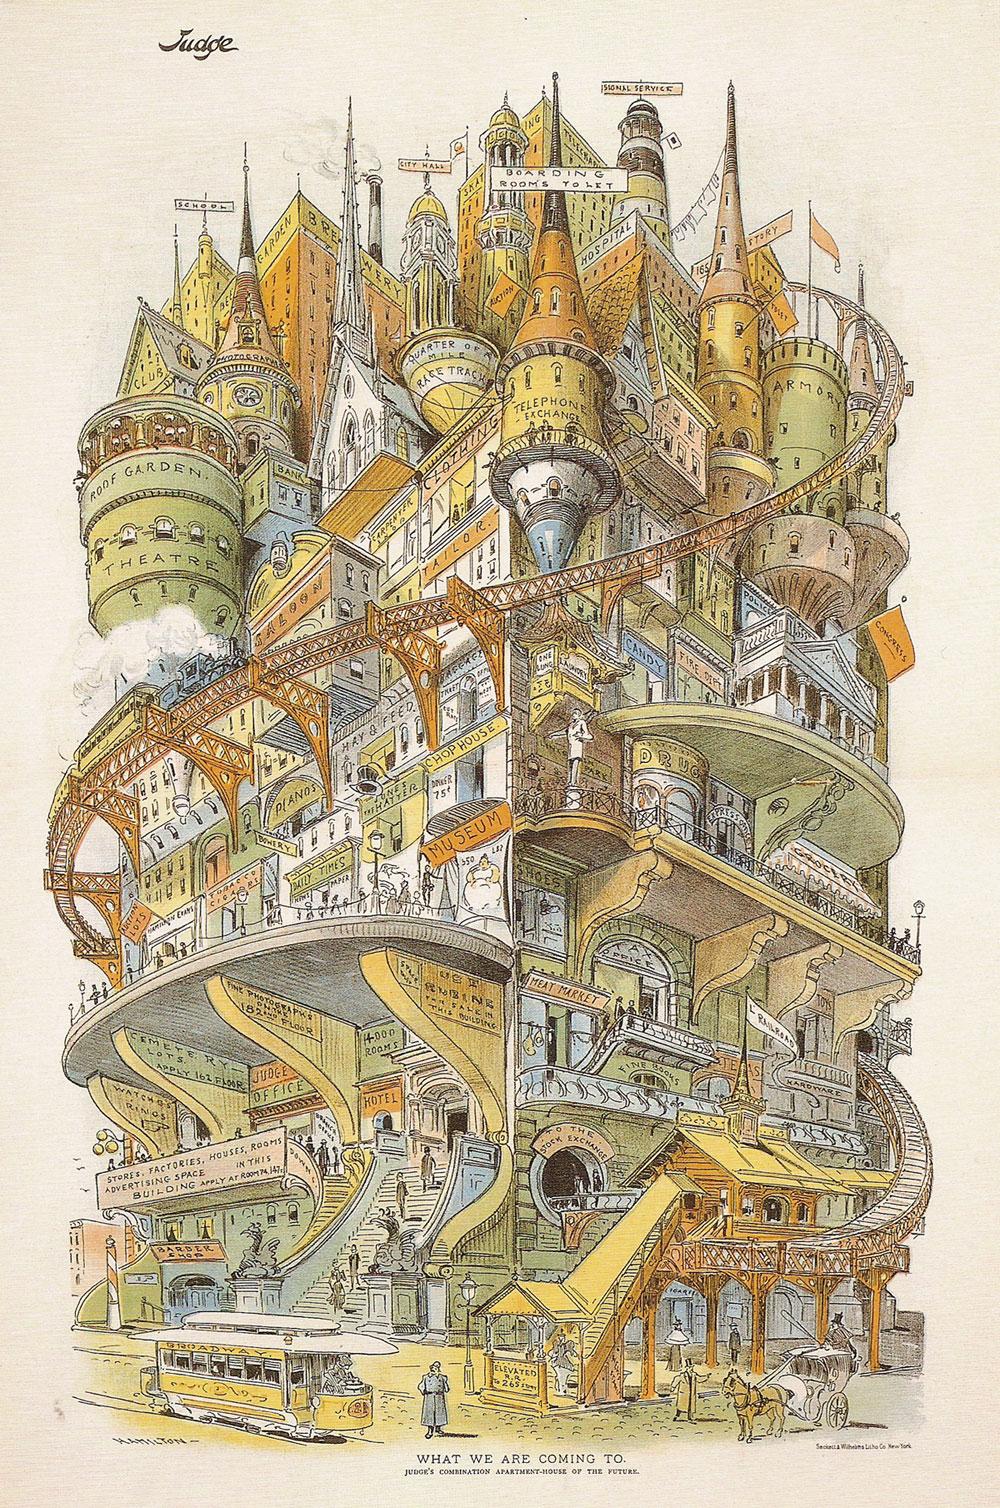 1895-feb-16-judge-magazine-.jpg